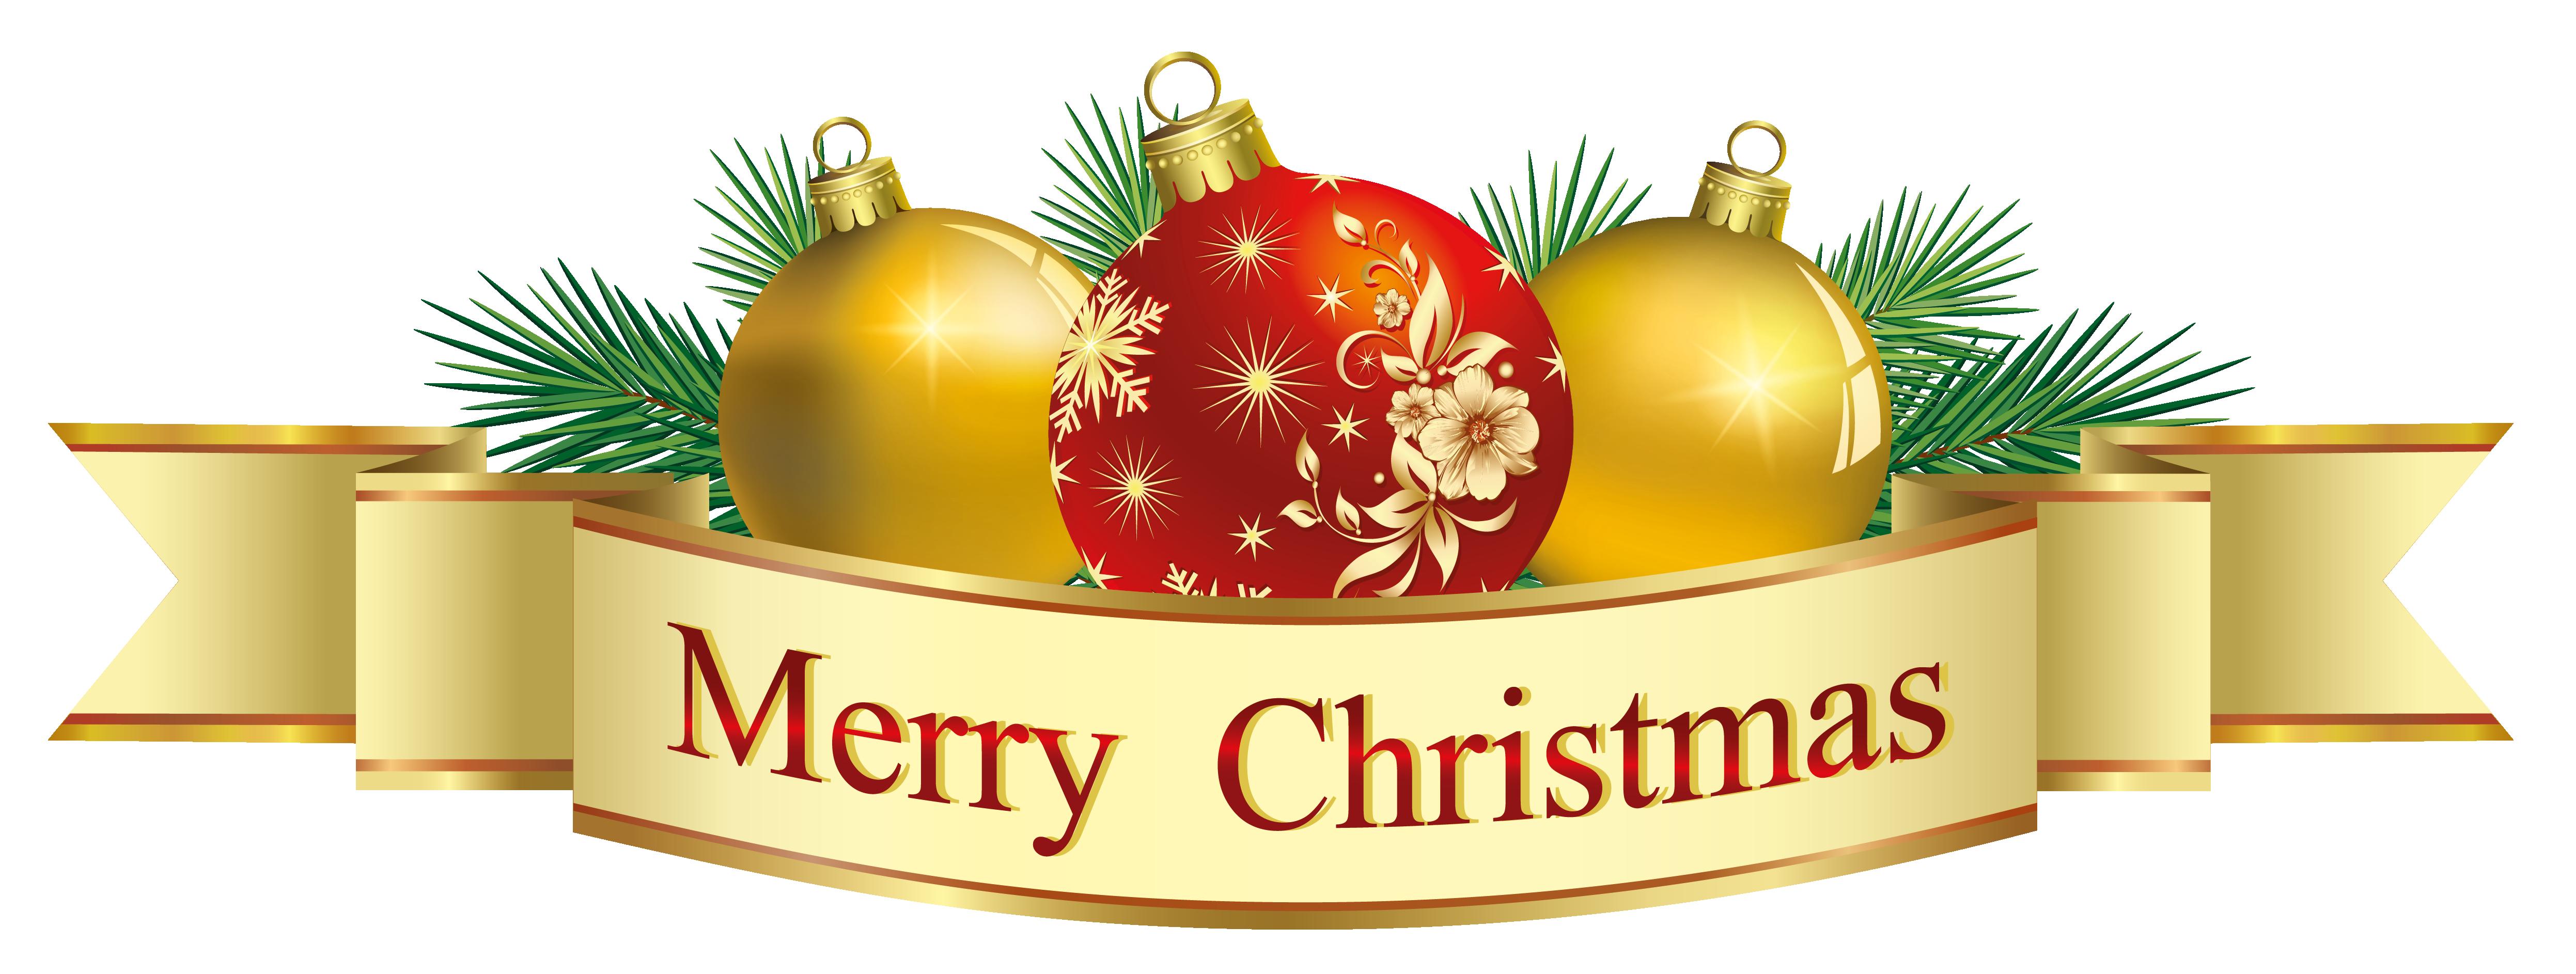 Holidays festive season